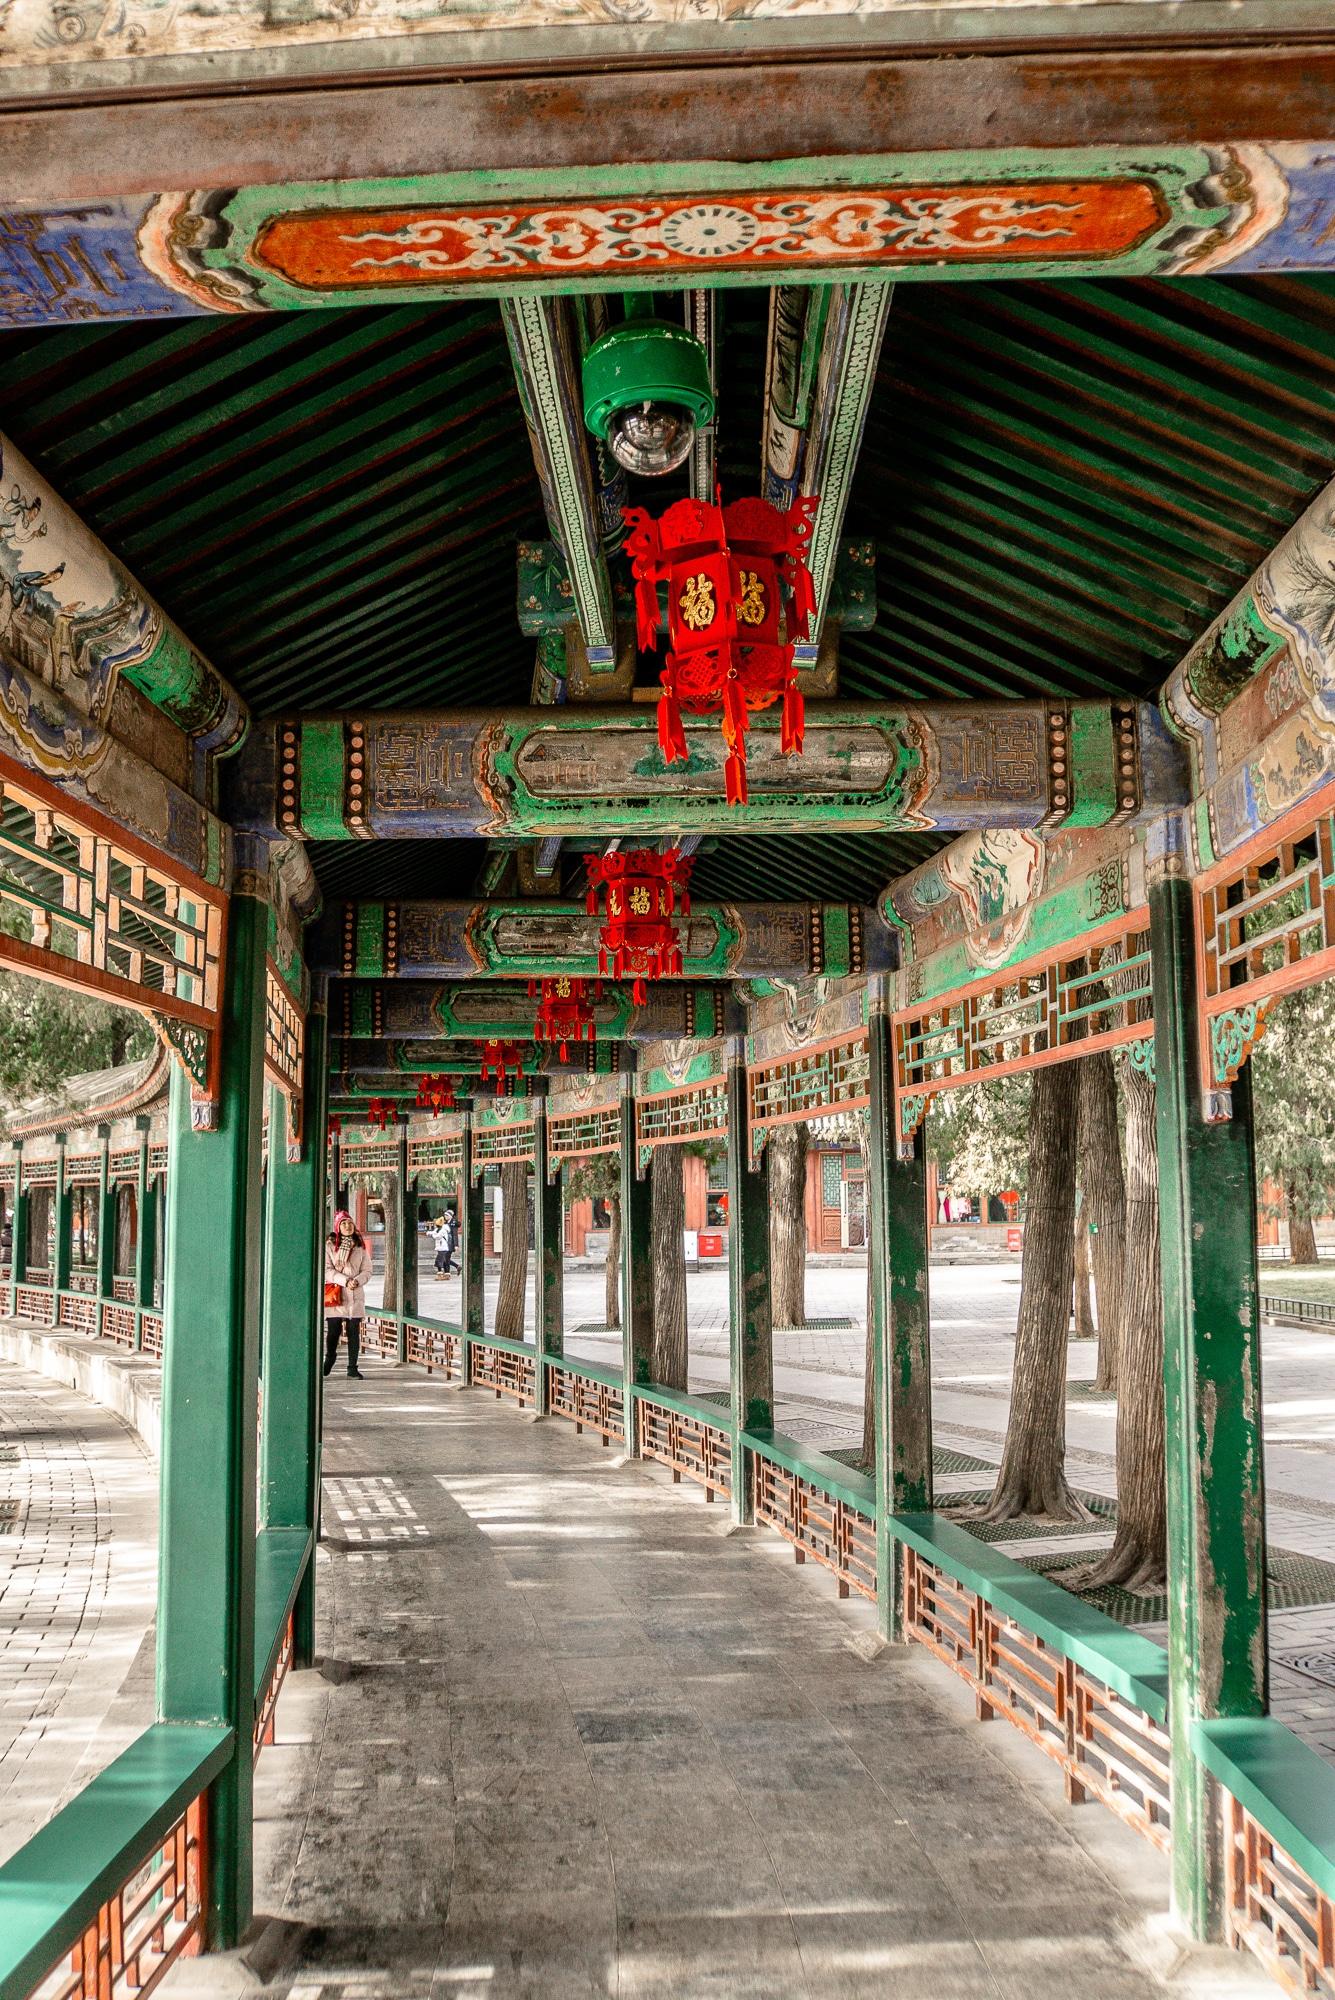 Sommerpalast in Peking: Die schönsten Sehenswürdigkeiten & Highlights - Wandelgang / Long Corridor